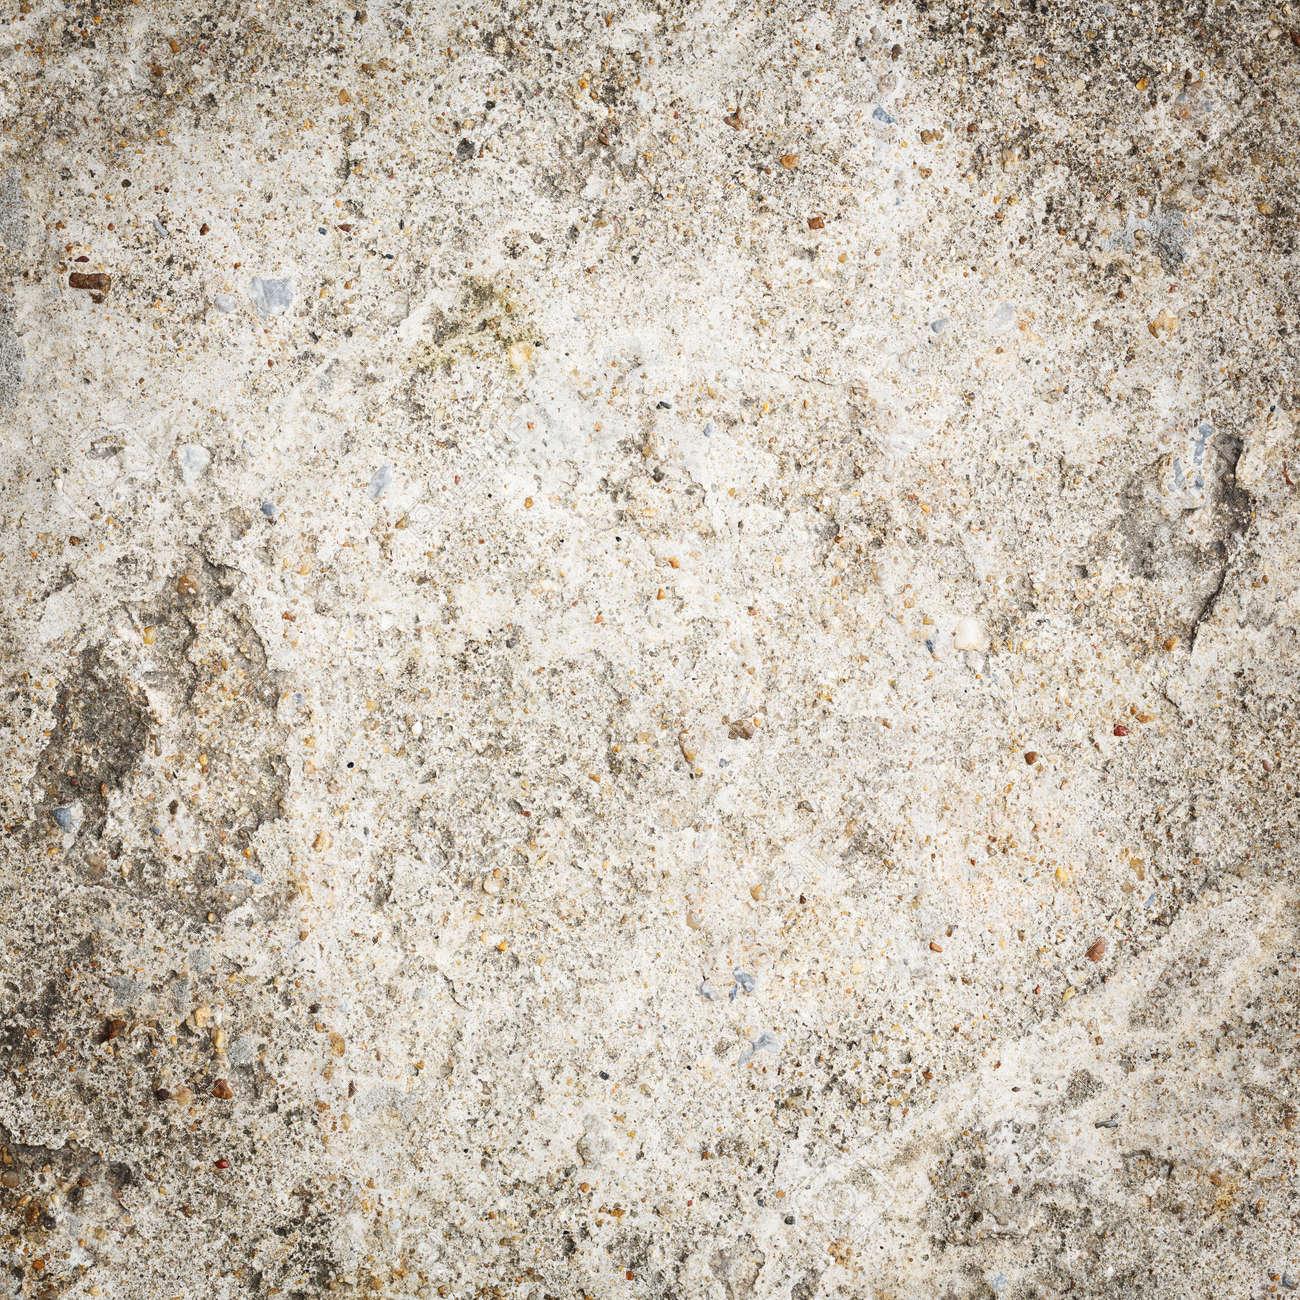 Dirty Concrete Floor Texture